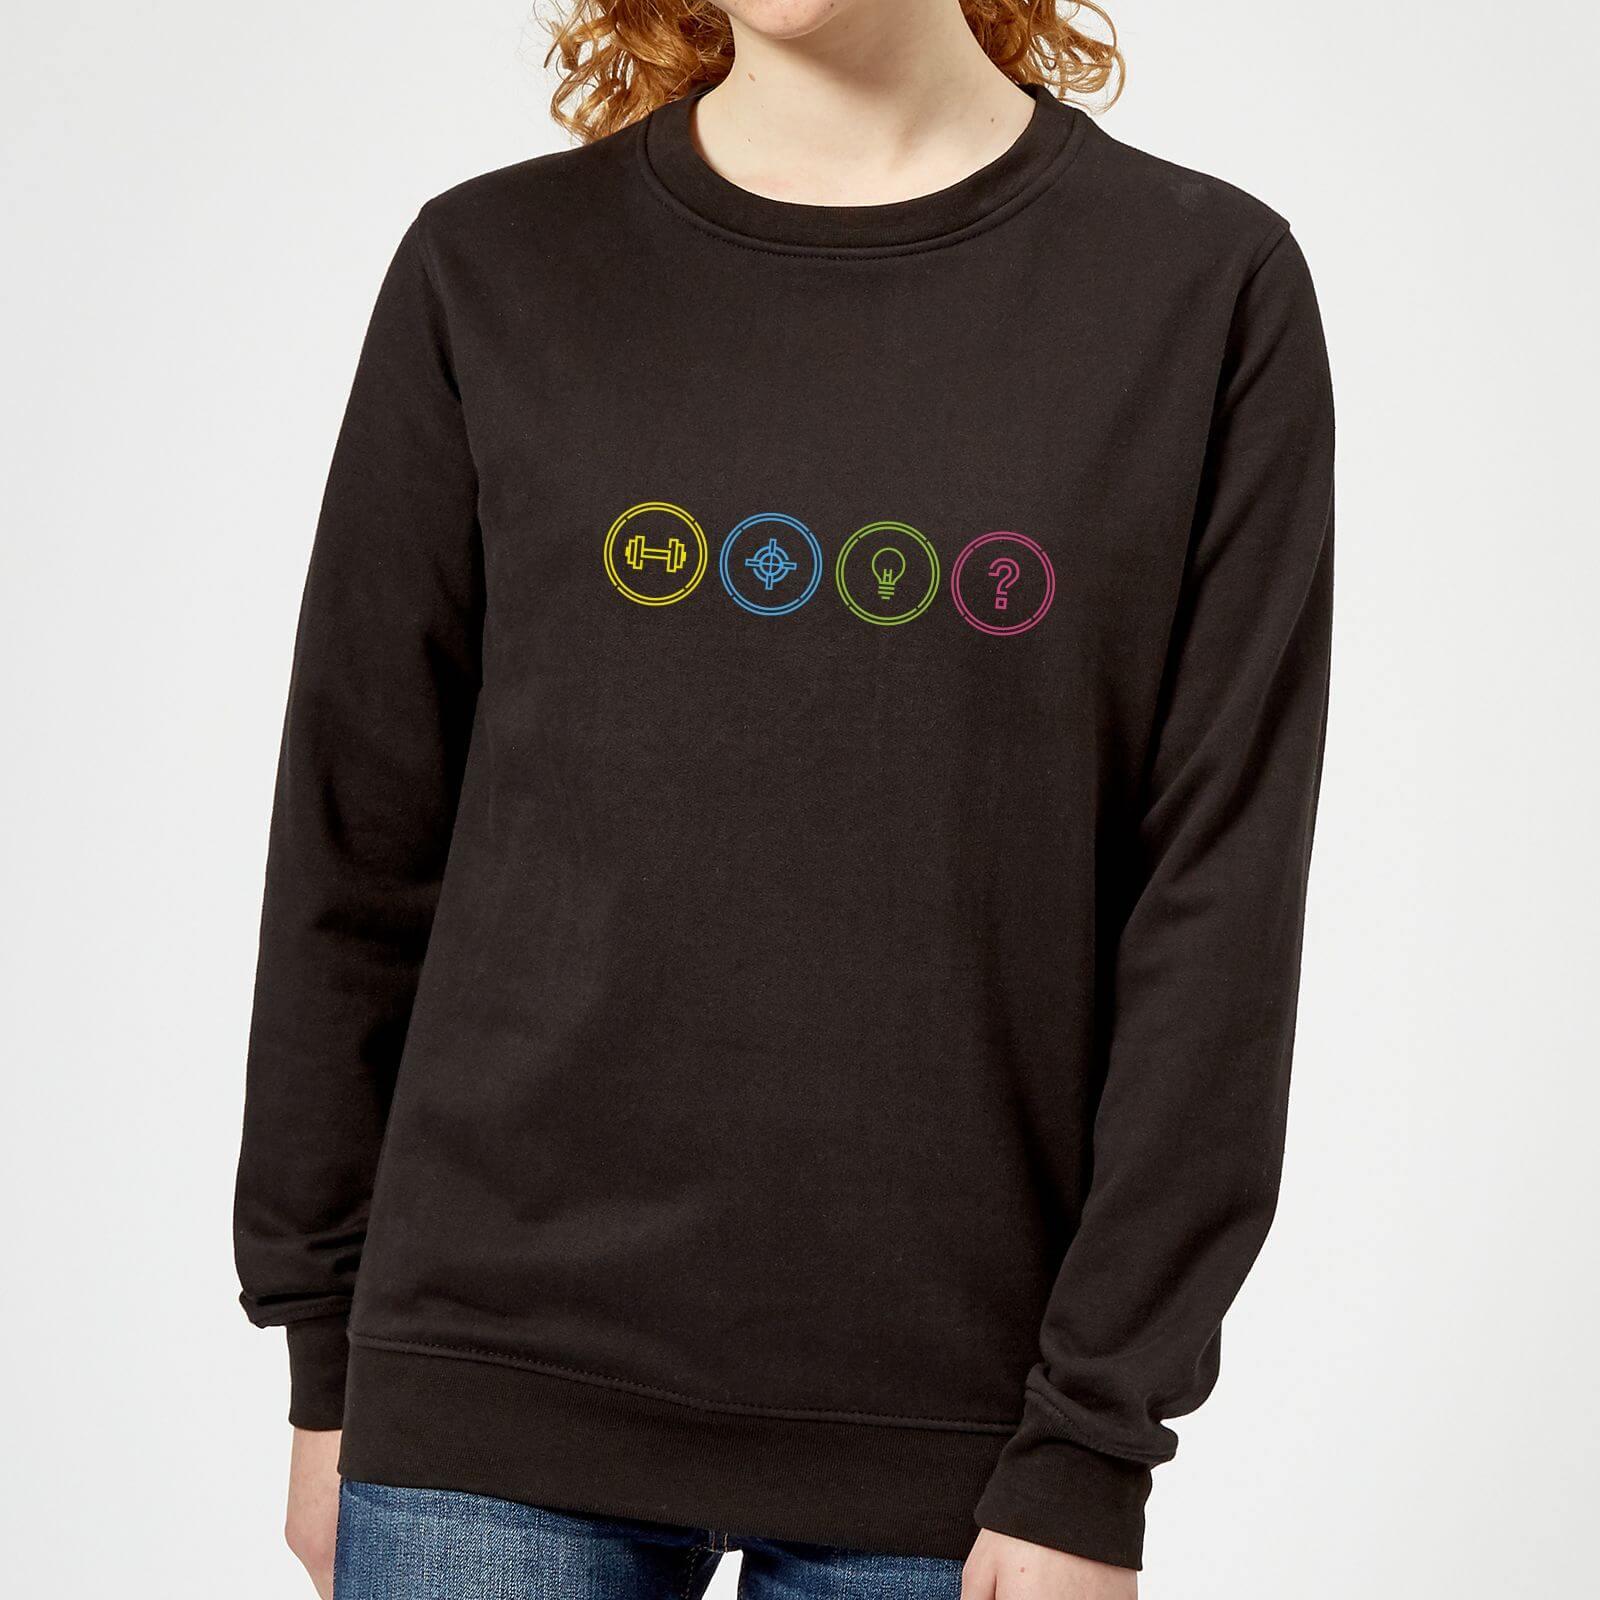 Crystal Maze Game Modes Women's Sweatshirt - Black - XL - Black